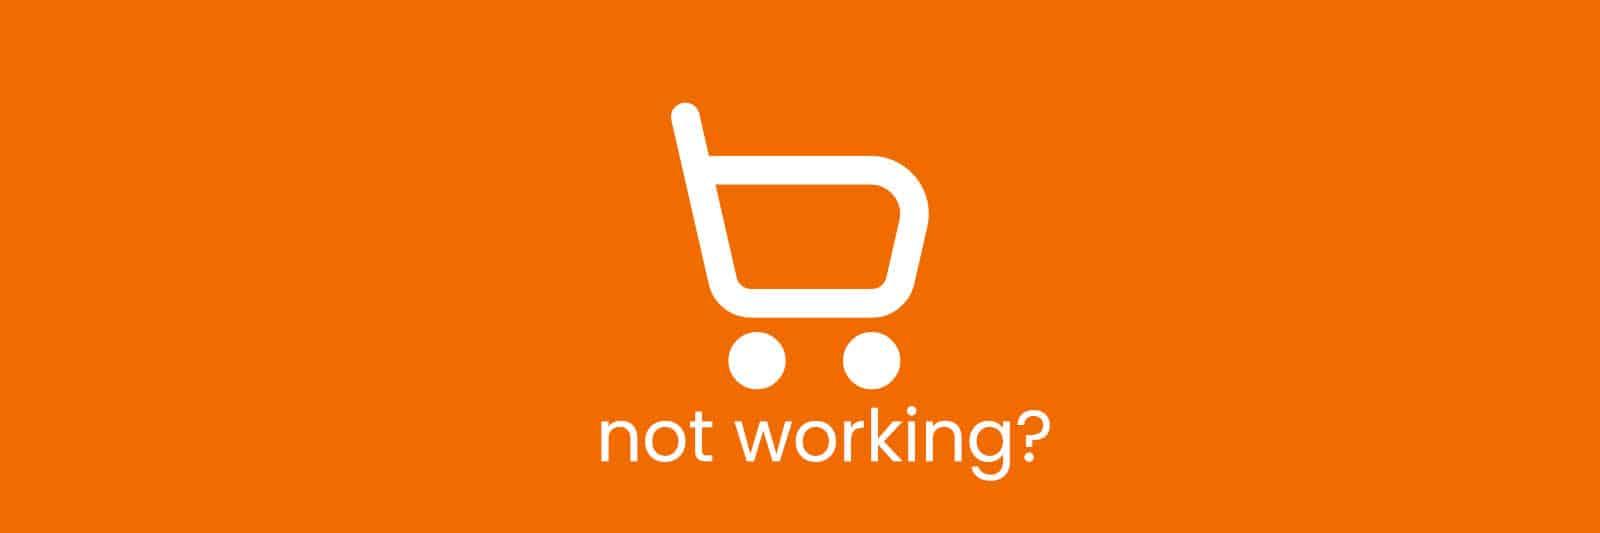 sainsburys-app-not-working